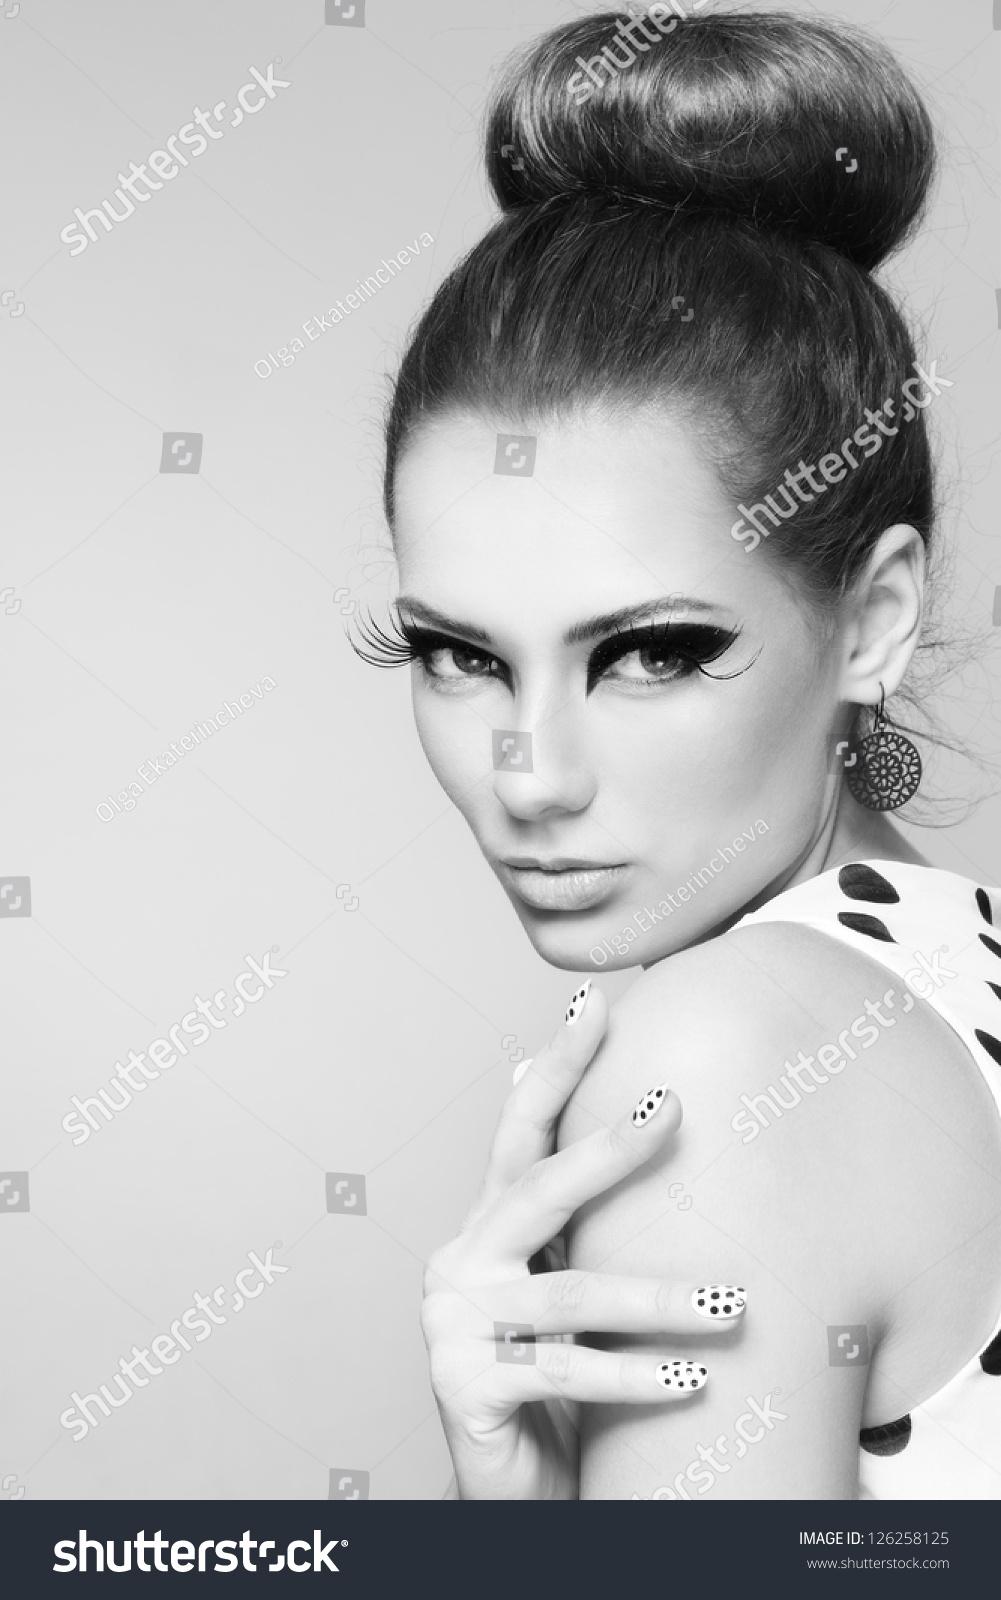 Black White Portrait Young Beautiful Girl Stock Photo 126258125 - Shutterstock-3696